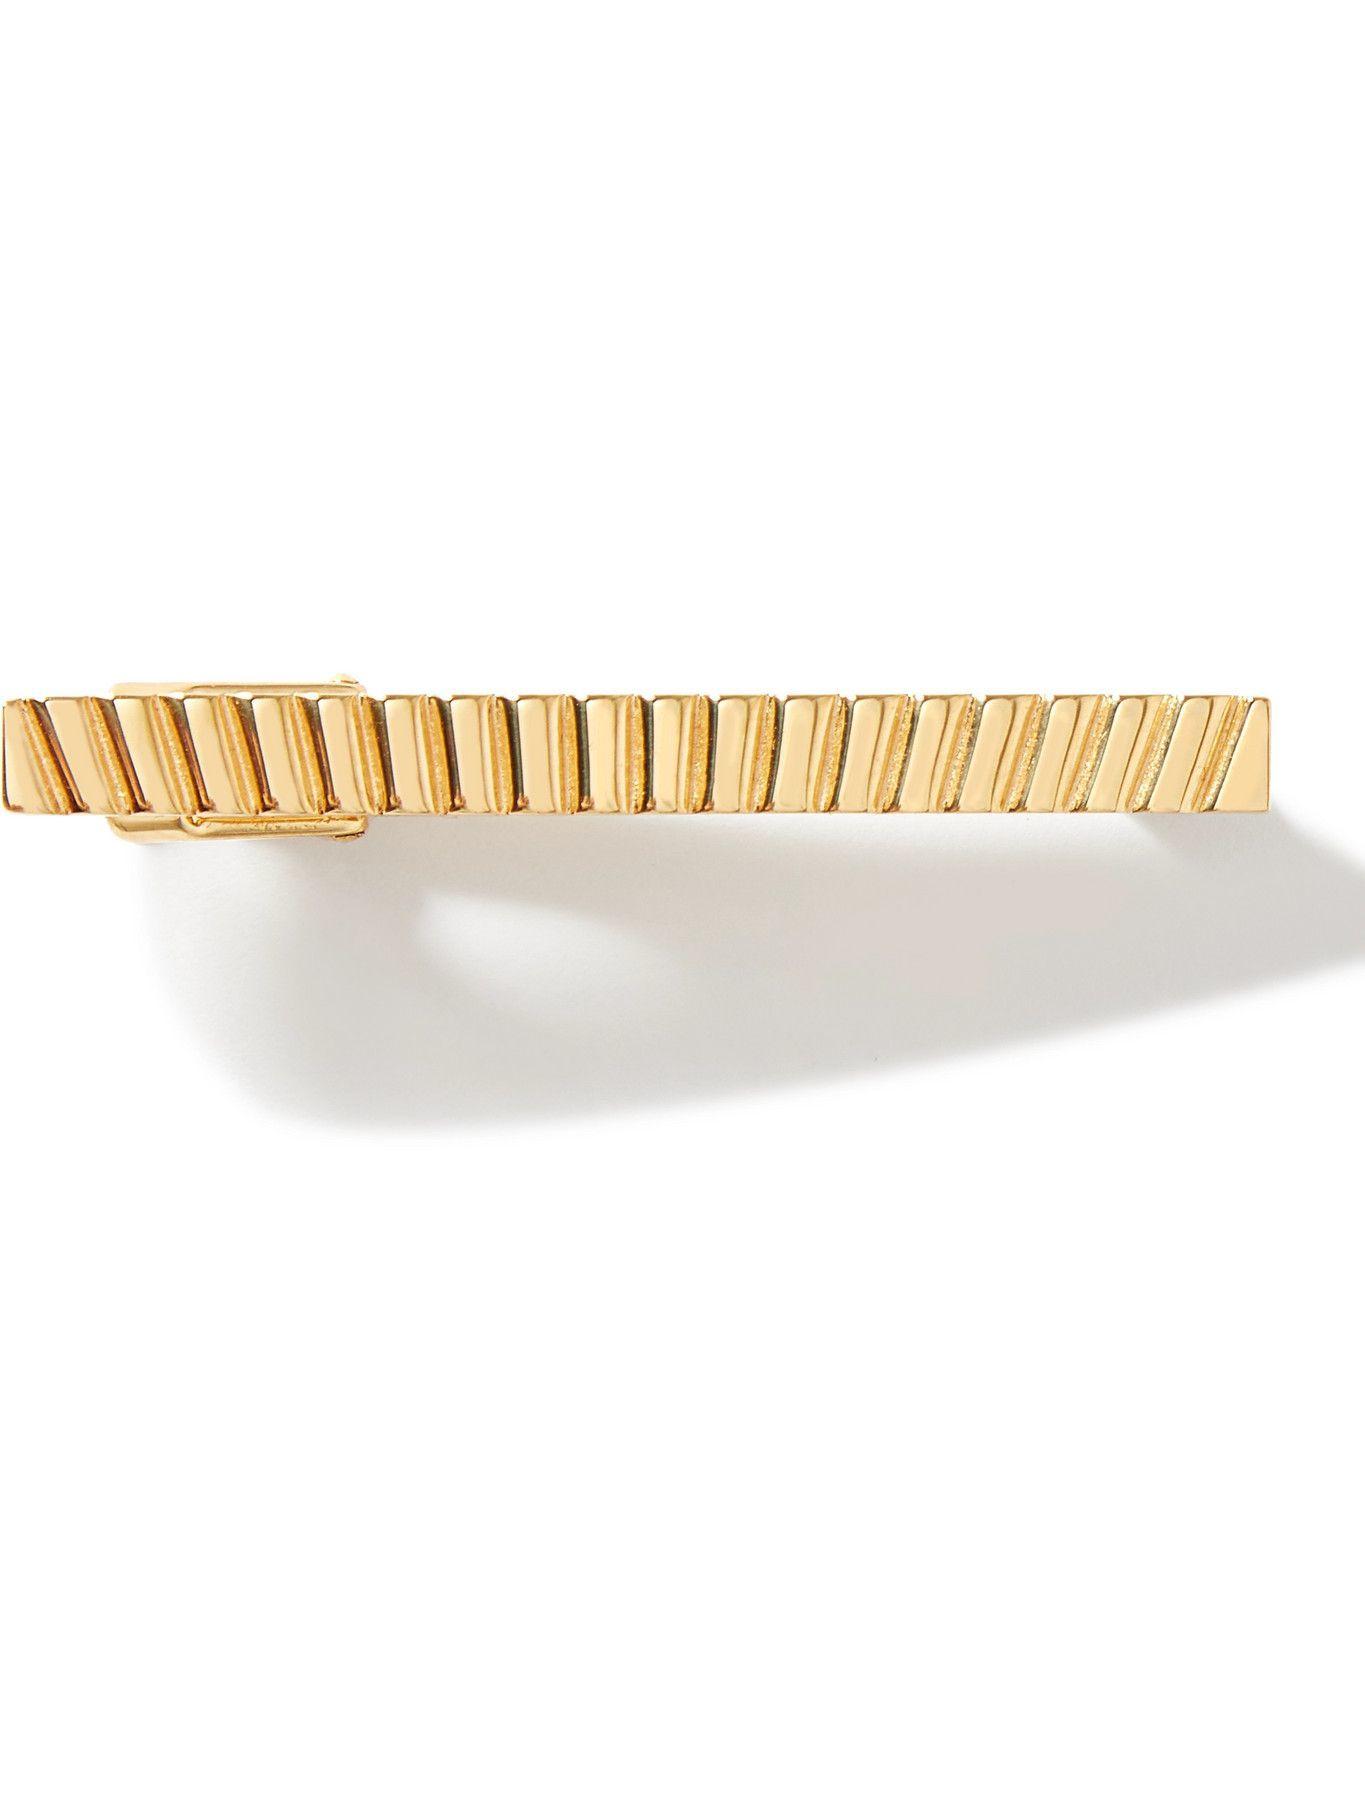 Photo: LANVIN - Gold-Plated Tie Clip